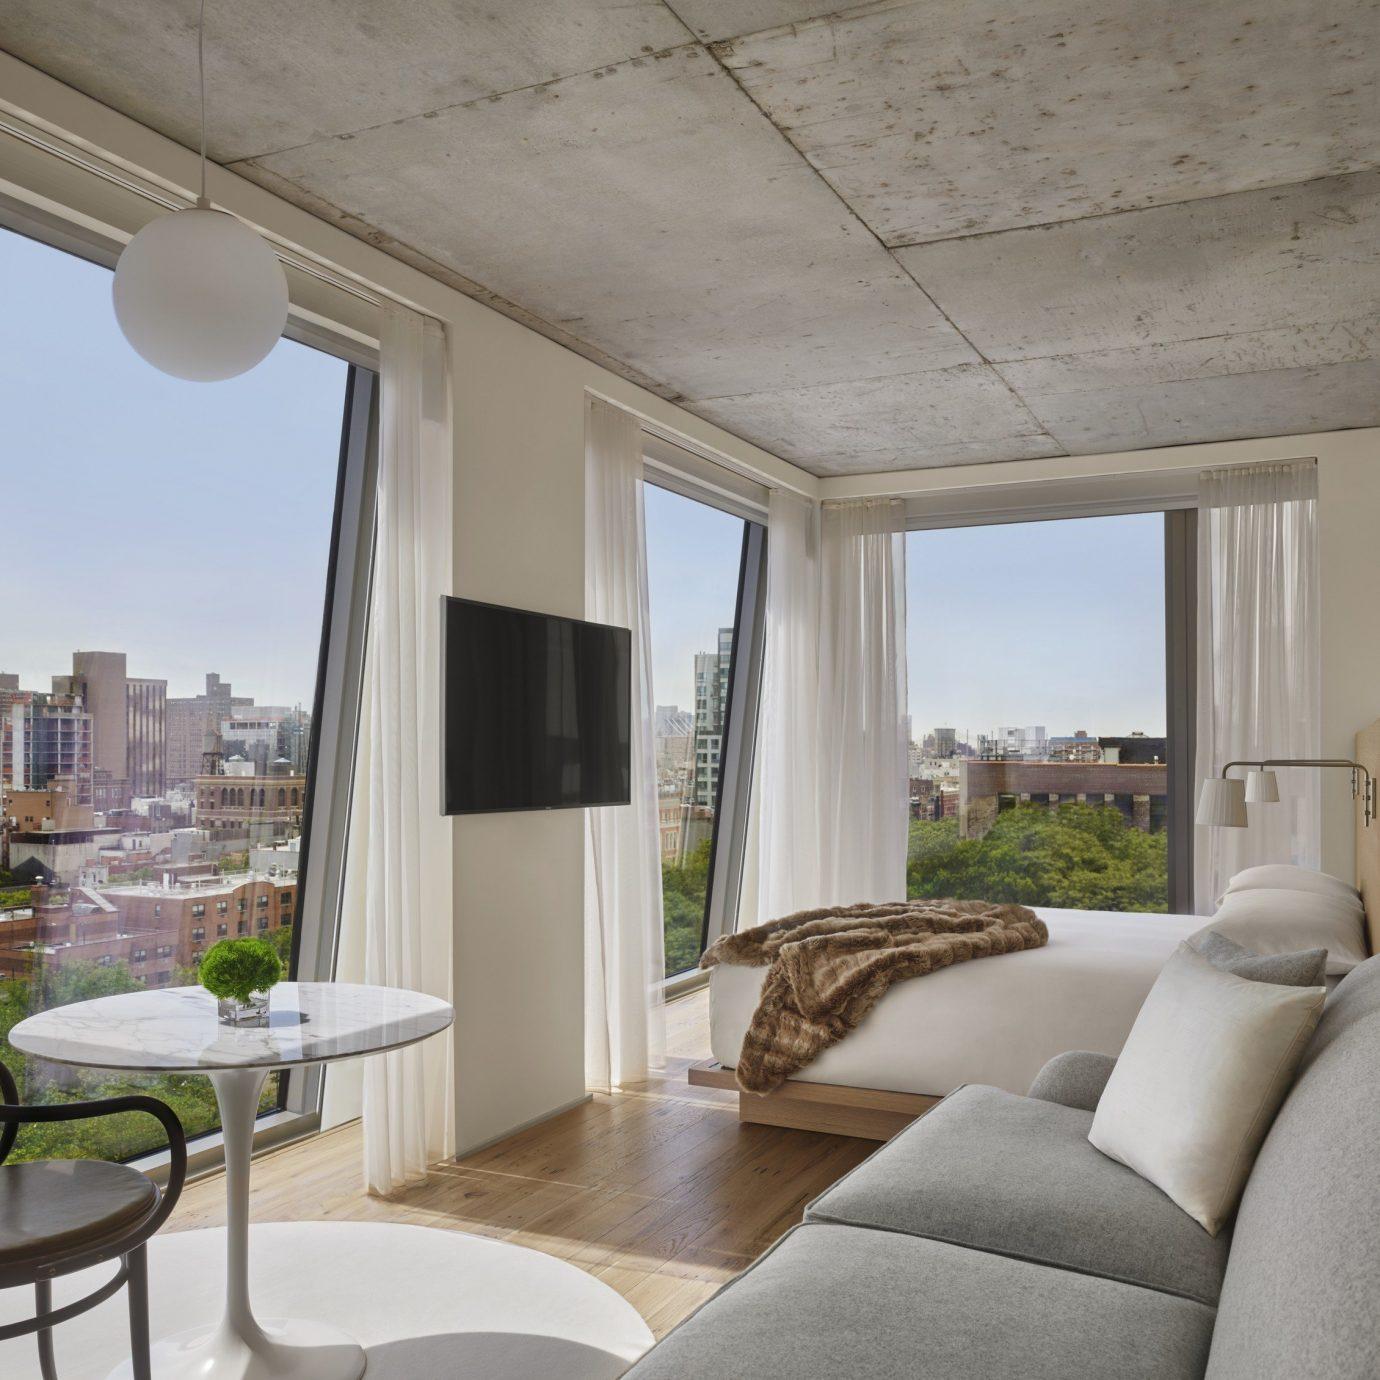 sofa property living room penthouse apartment house interior designer daylighting nice condominium Modern